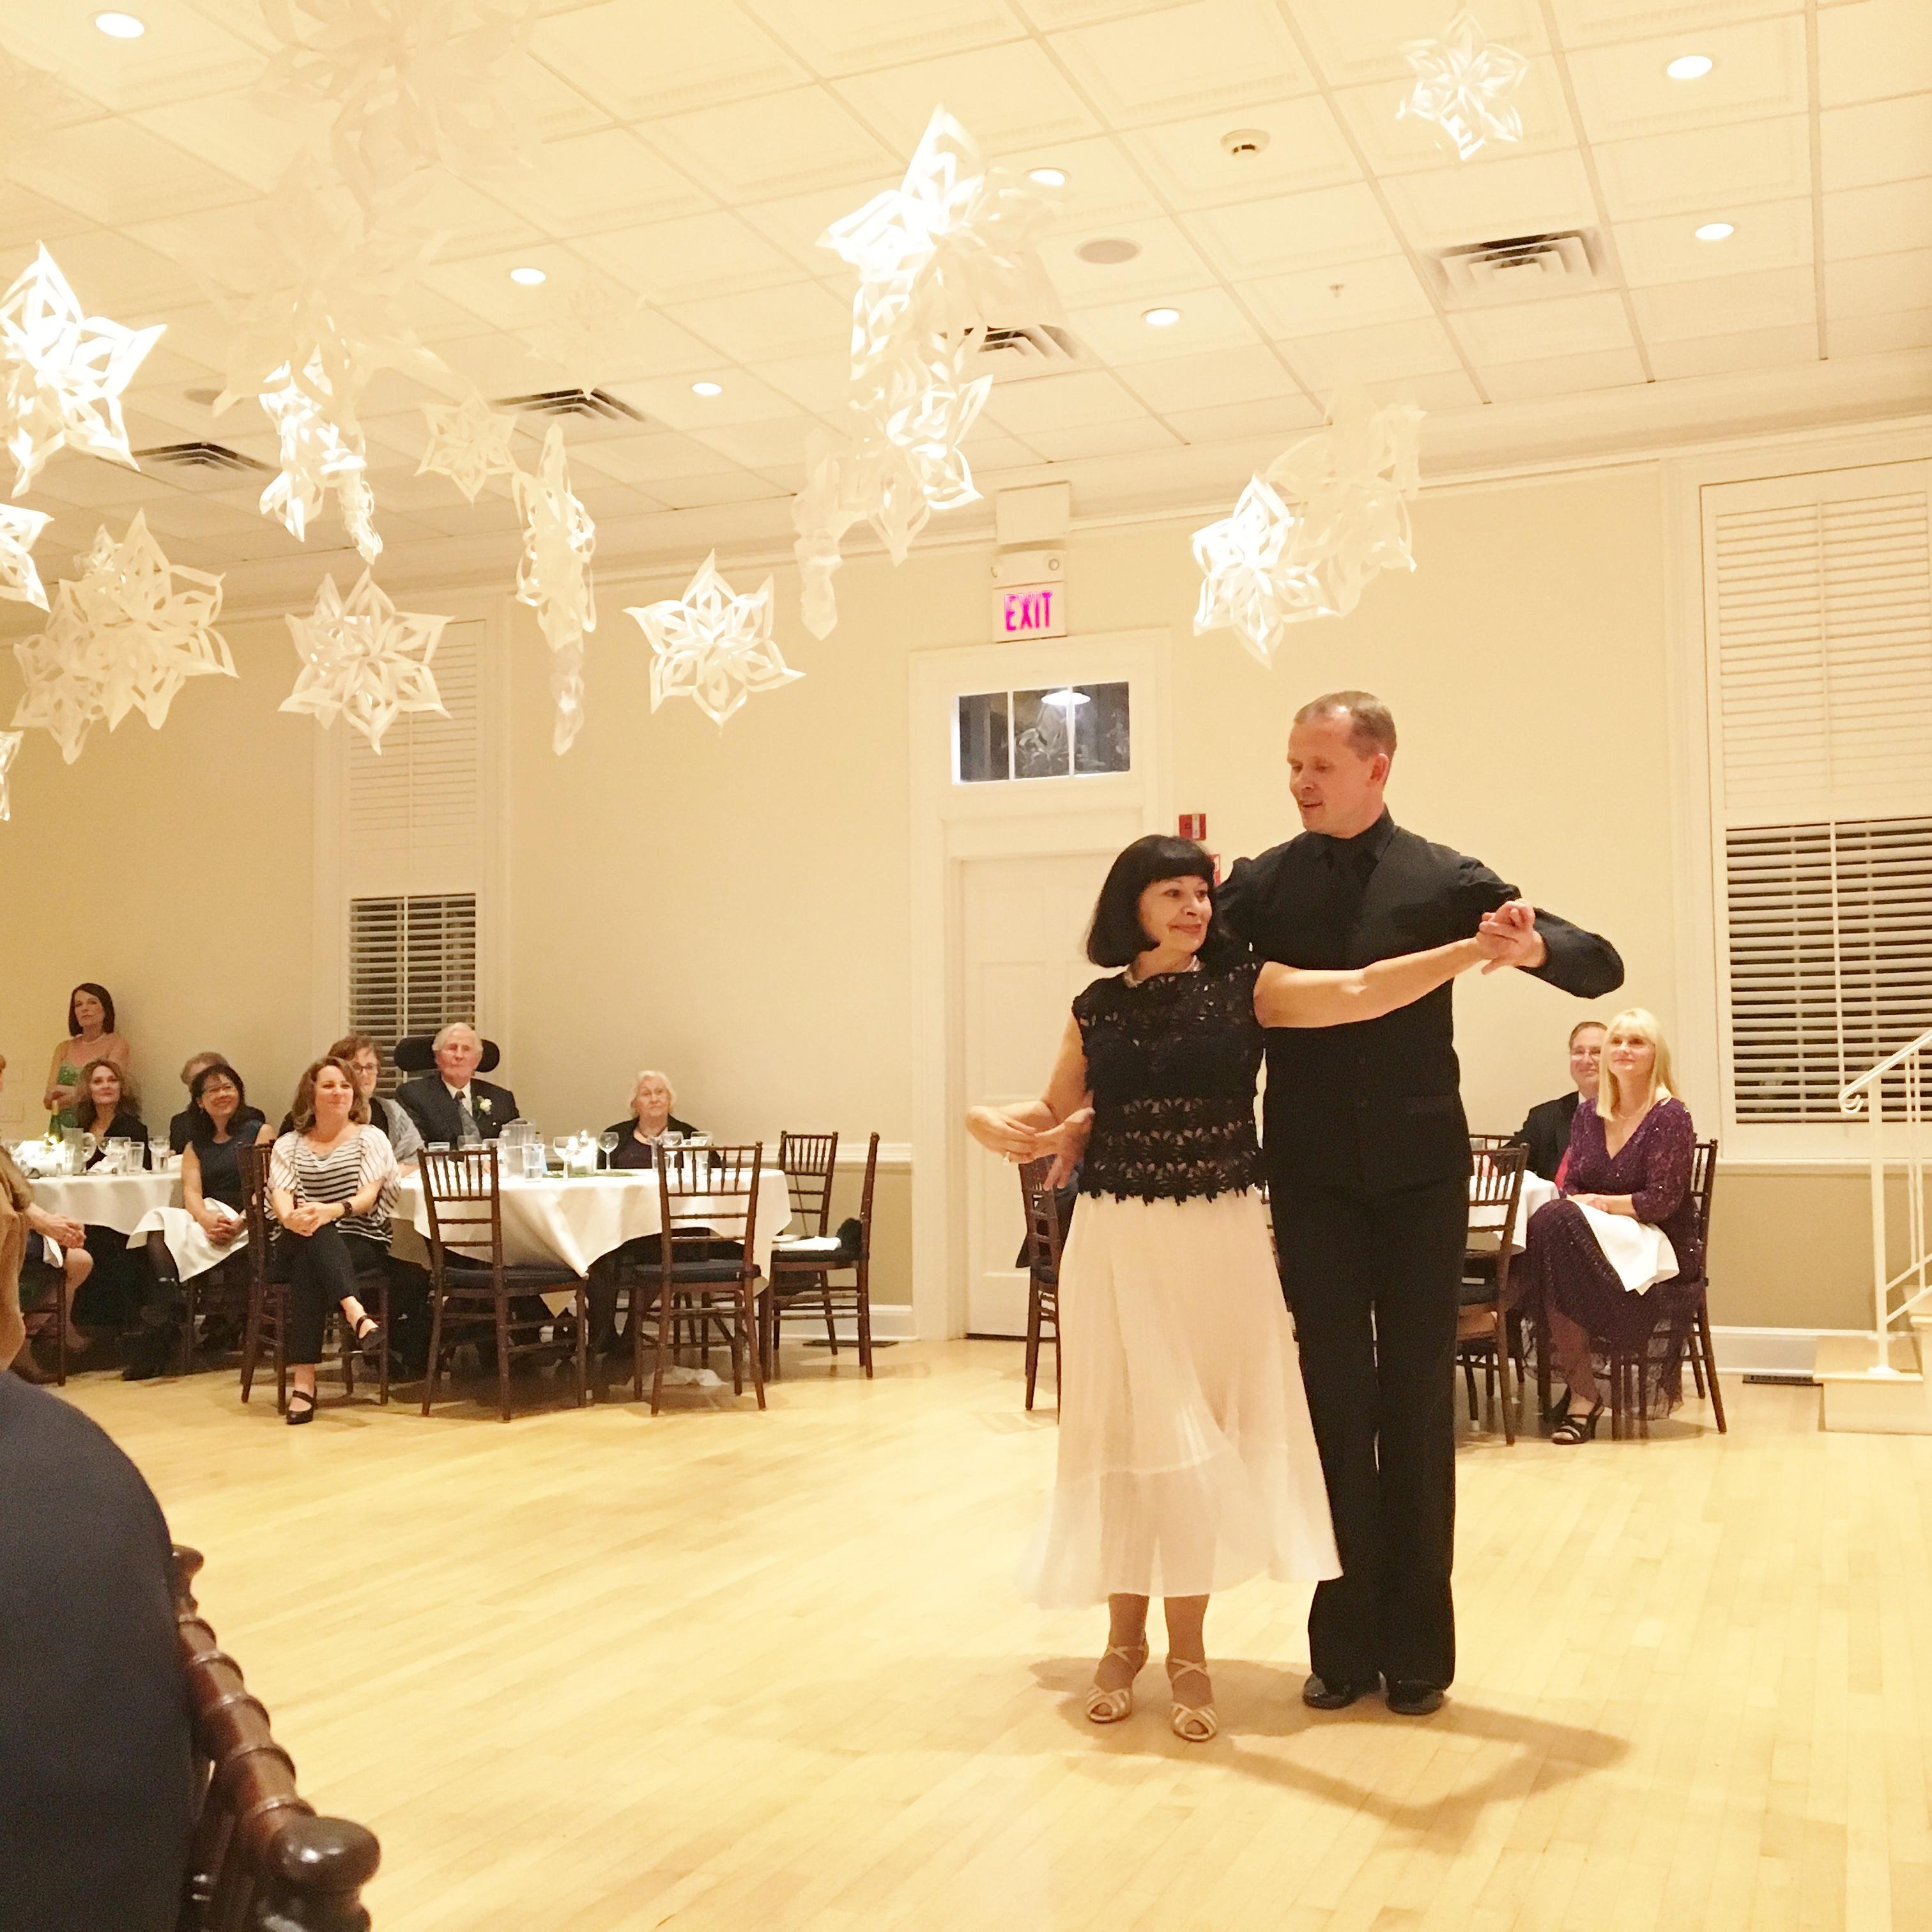 In The Mood - Ballroom Dancing (3)